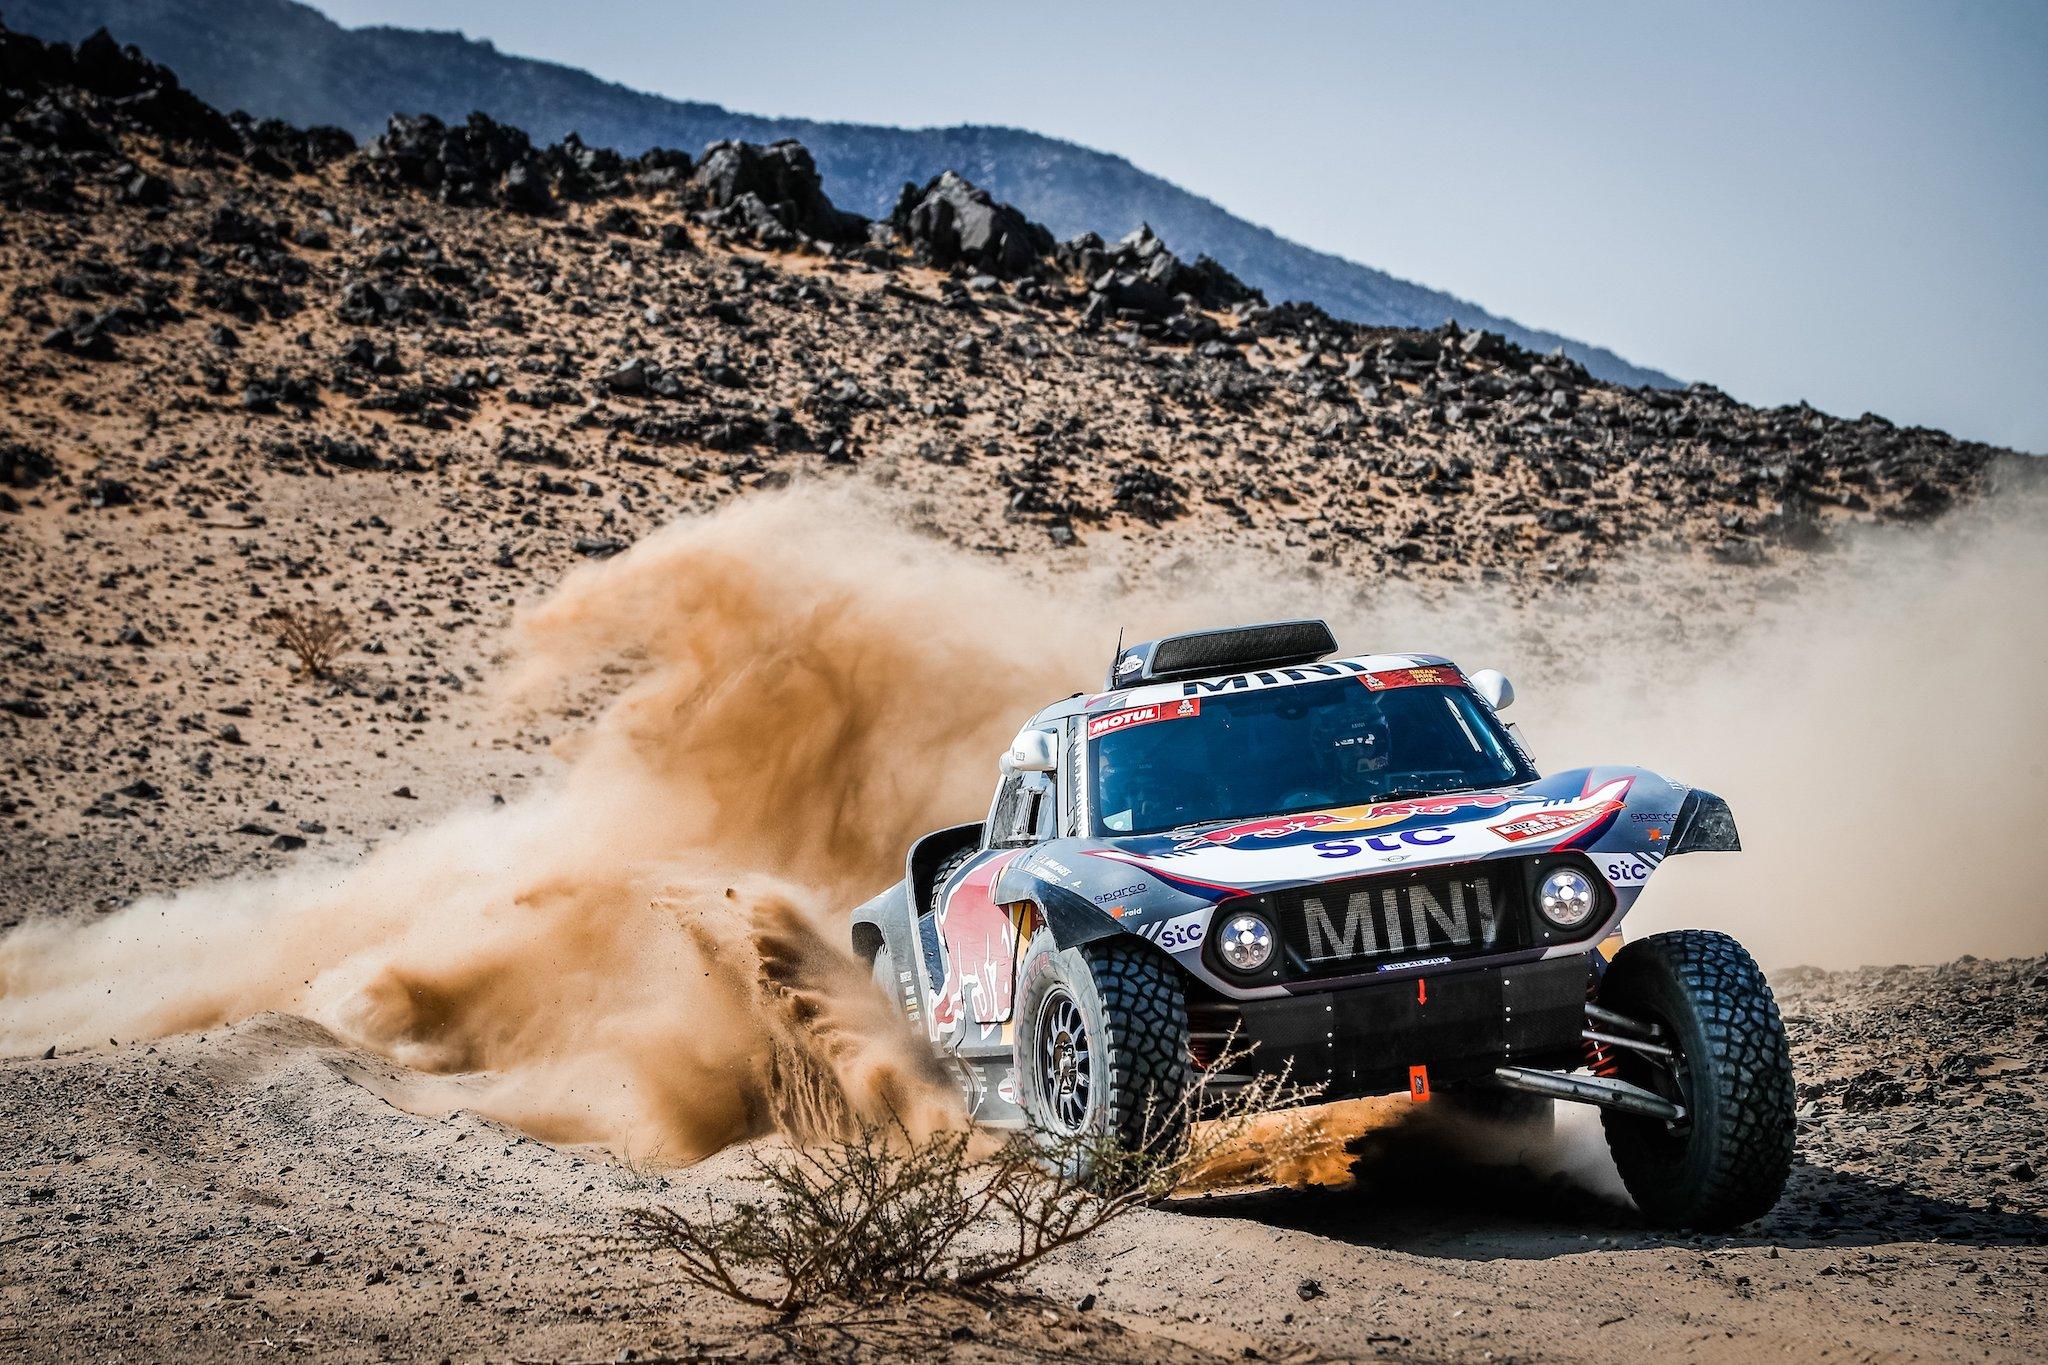 2021 MINI 勇奪史上第六座達卡拉力賽冠軍榮耀。